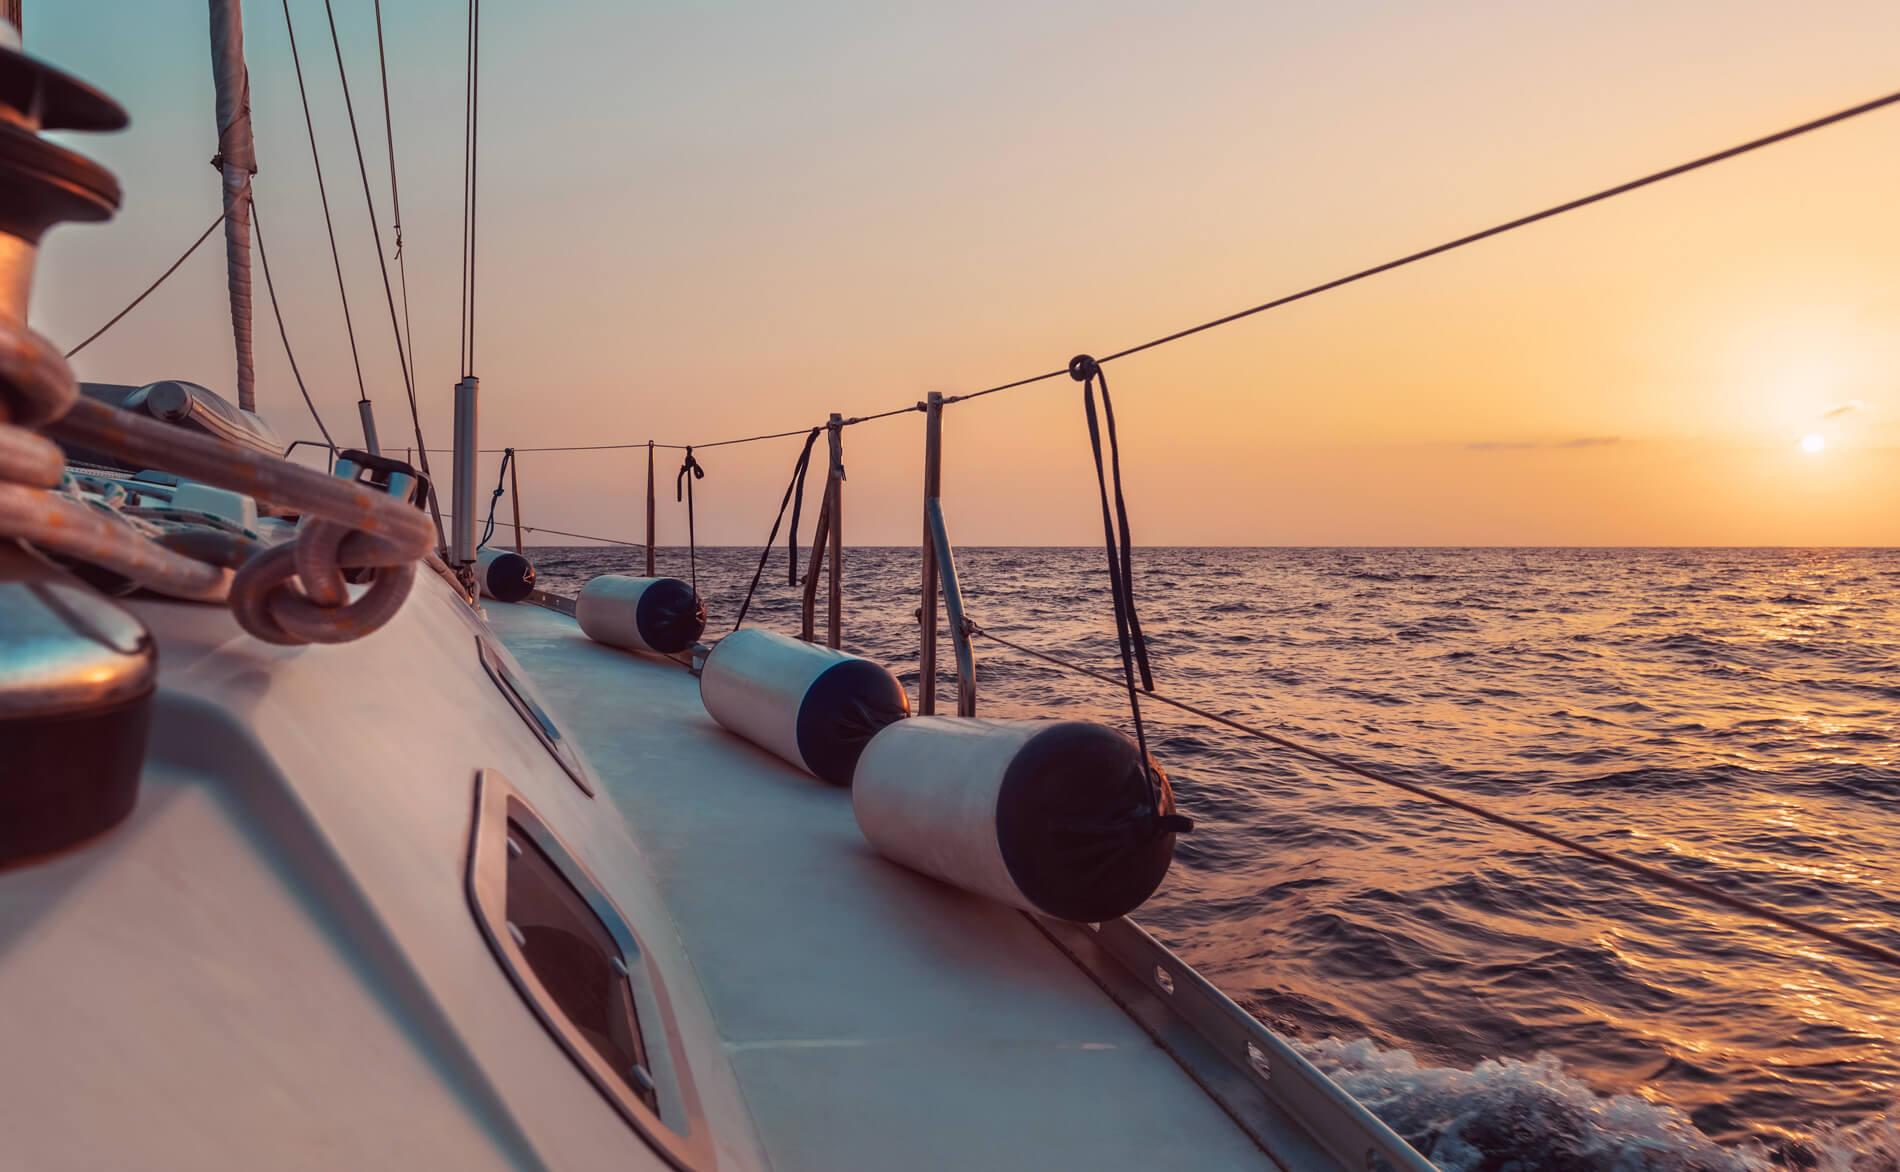 Elite Crete - Luxury Tourism in Chania, Crete - Sailing